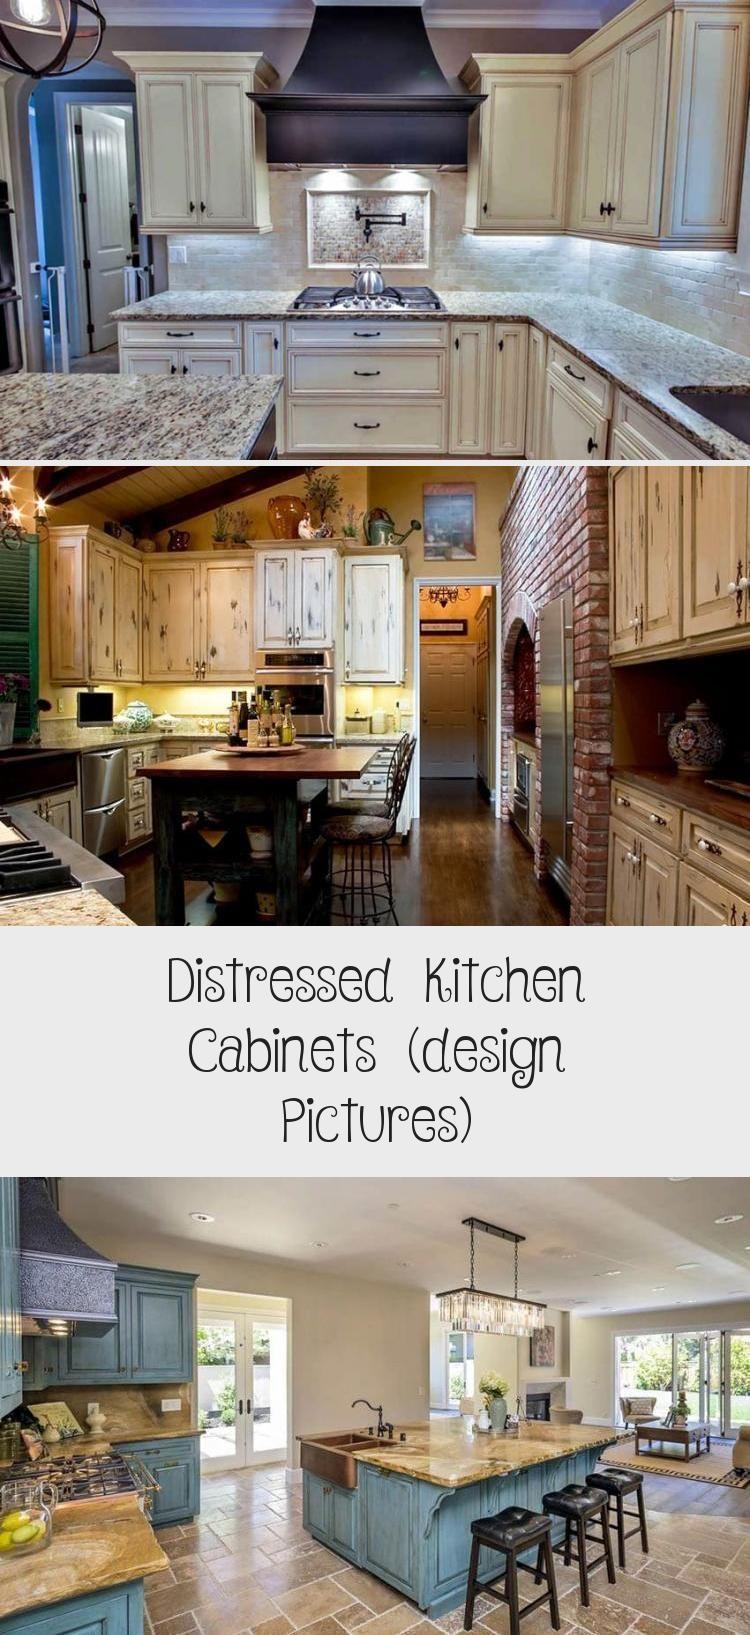 Black Kitchen Cabinets Blue Kitchen Cabinets Brown Kitchen Cabinets Cheap Kitchen Cabinets Countr In 2020 Beautiful Kitchens Maple Cabinets Brown Kitchen Cabinets